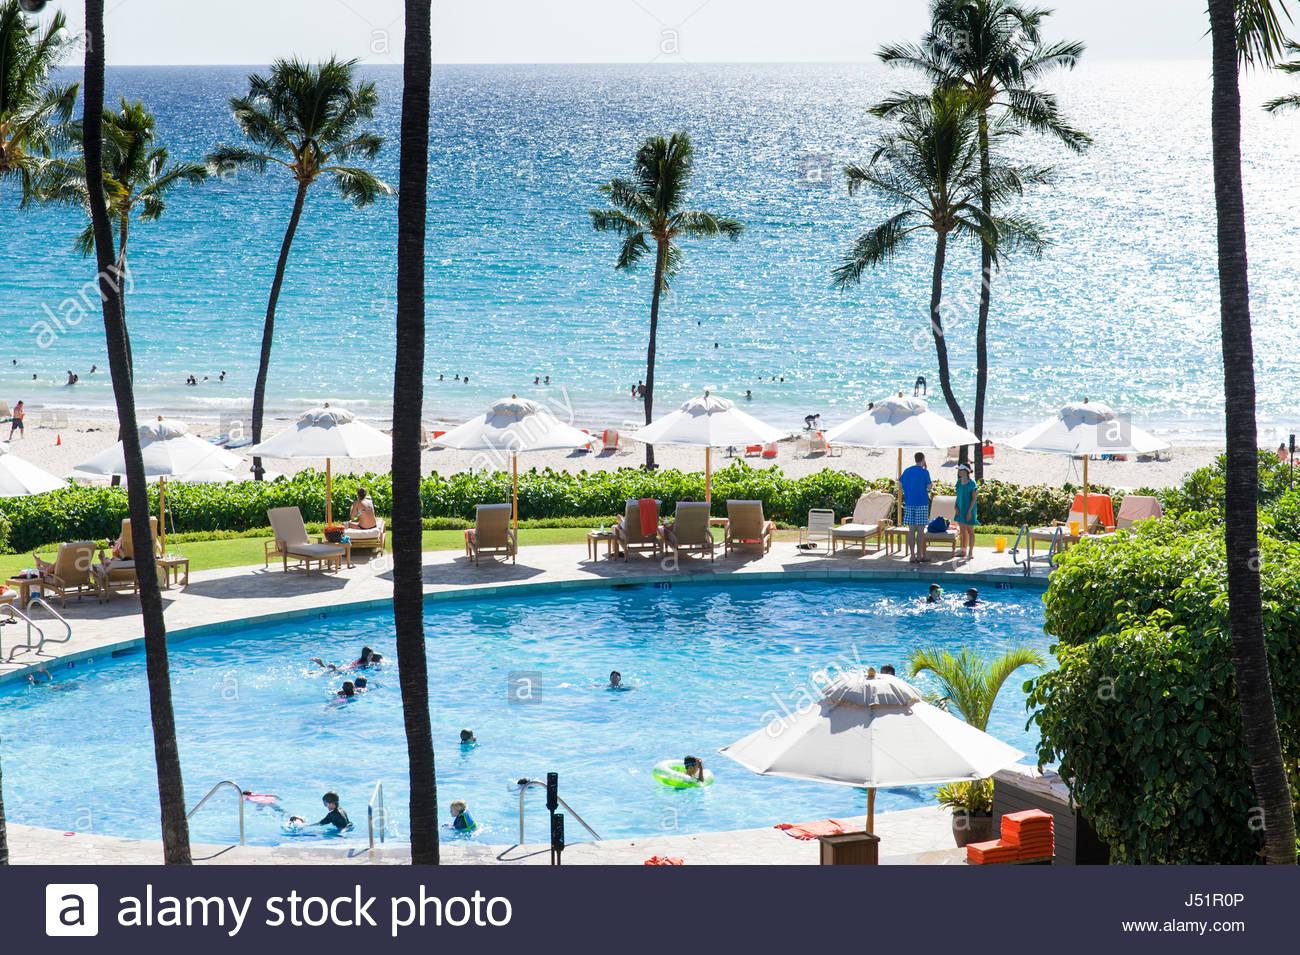 Mauna kea beach hotel stock photos mauna kea beach hotel - Hotels with saltwater swimming pools ...